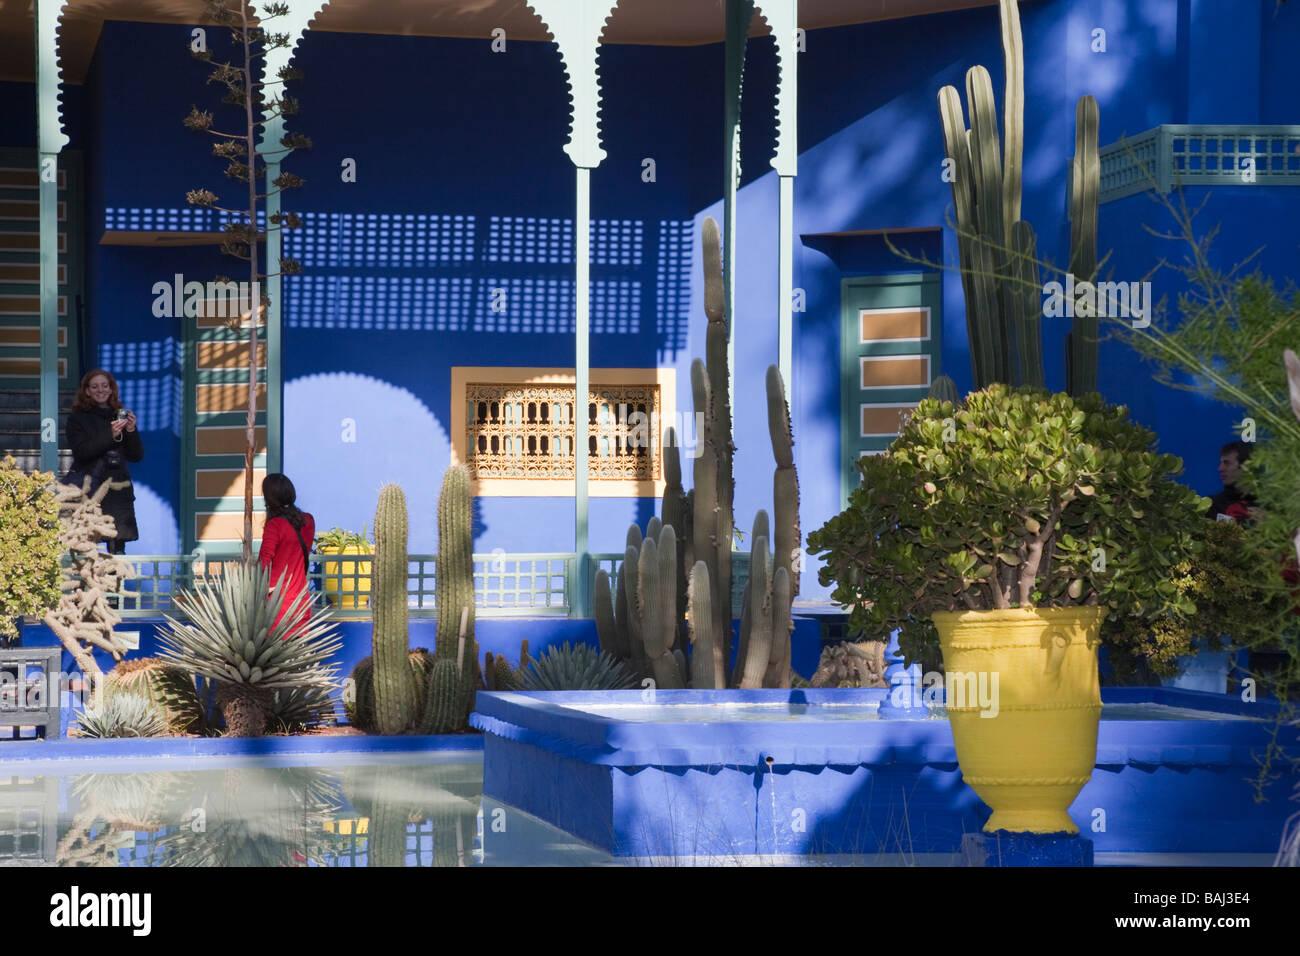 Museum of Moroccan Art in Jardin Marjorelle gardens Marrakech Morocco - Stock Image